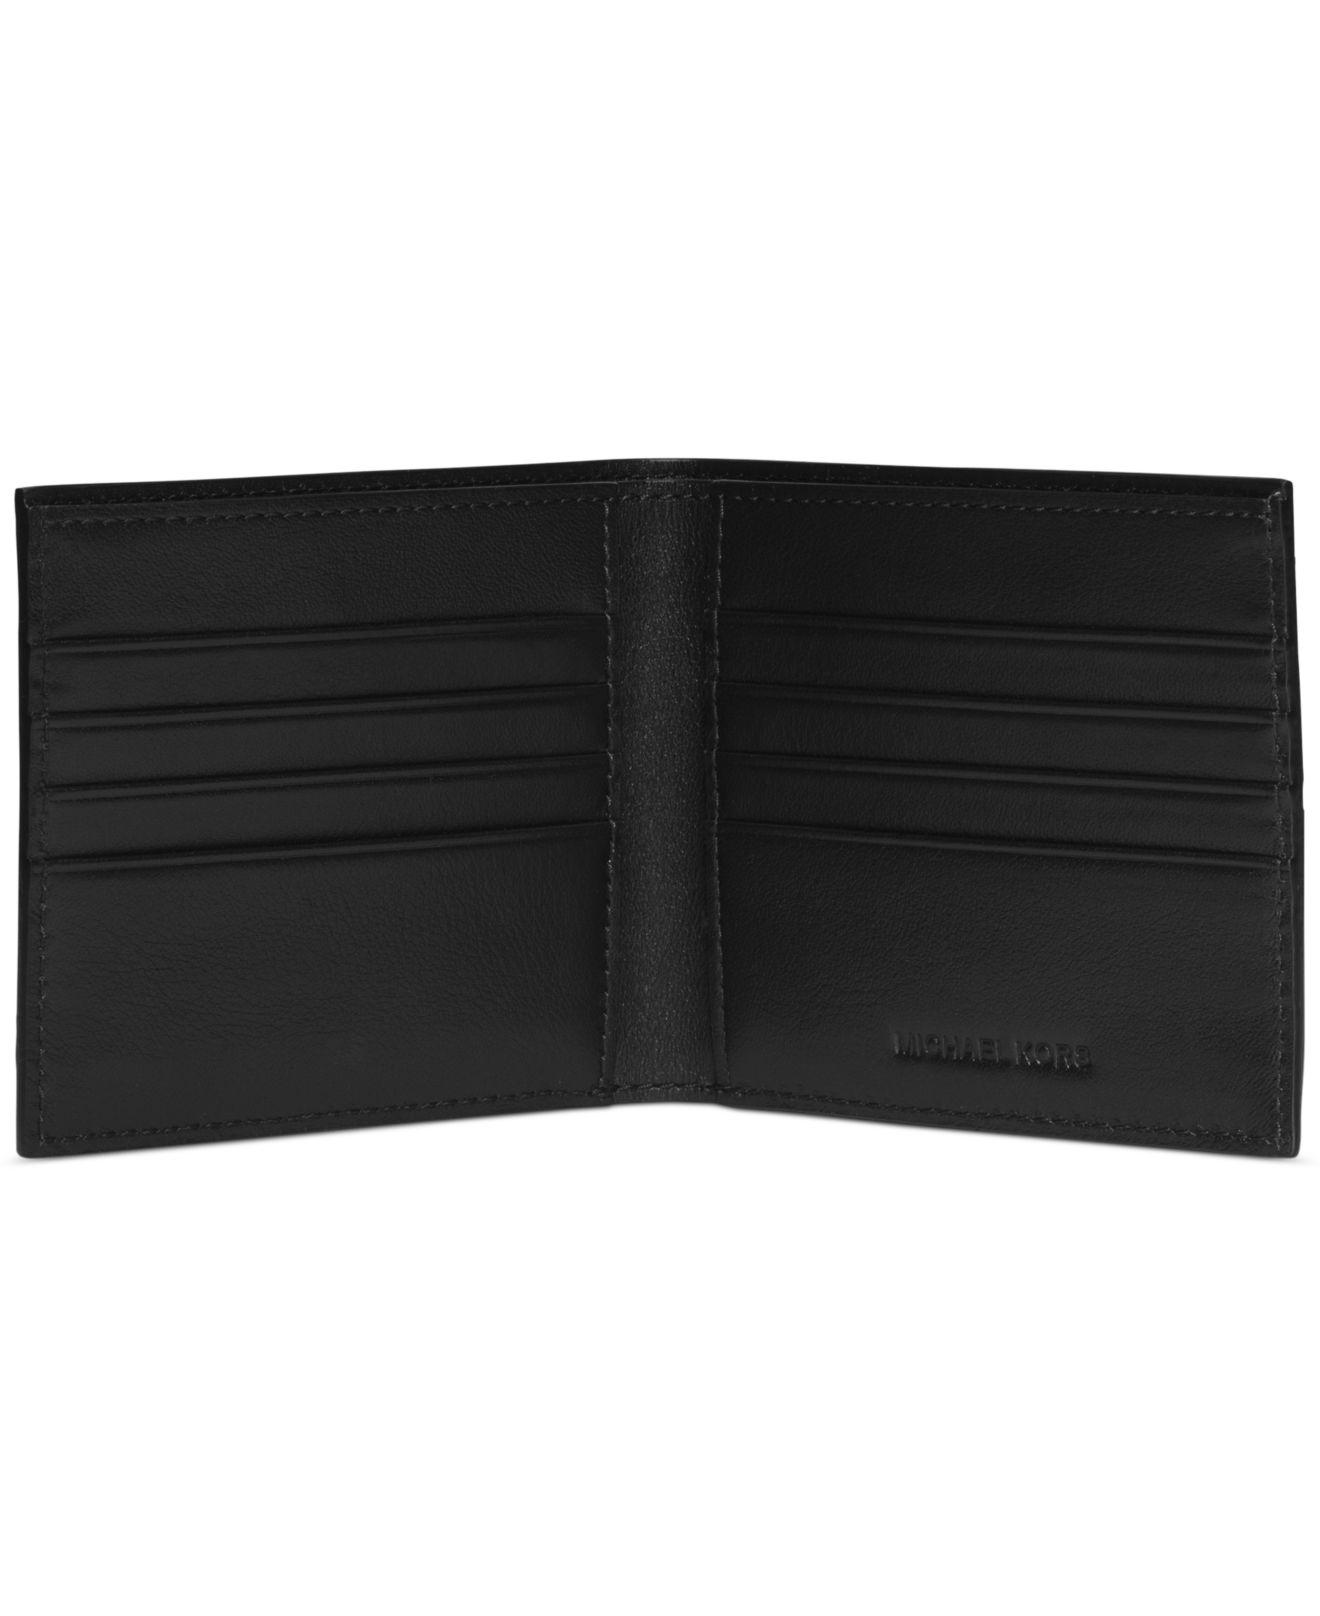 88b74ad171d498 Michael Kors Embossed Logo Jet Set Bifold Wallet in Black for Men - Lyst